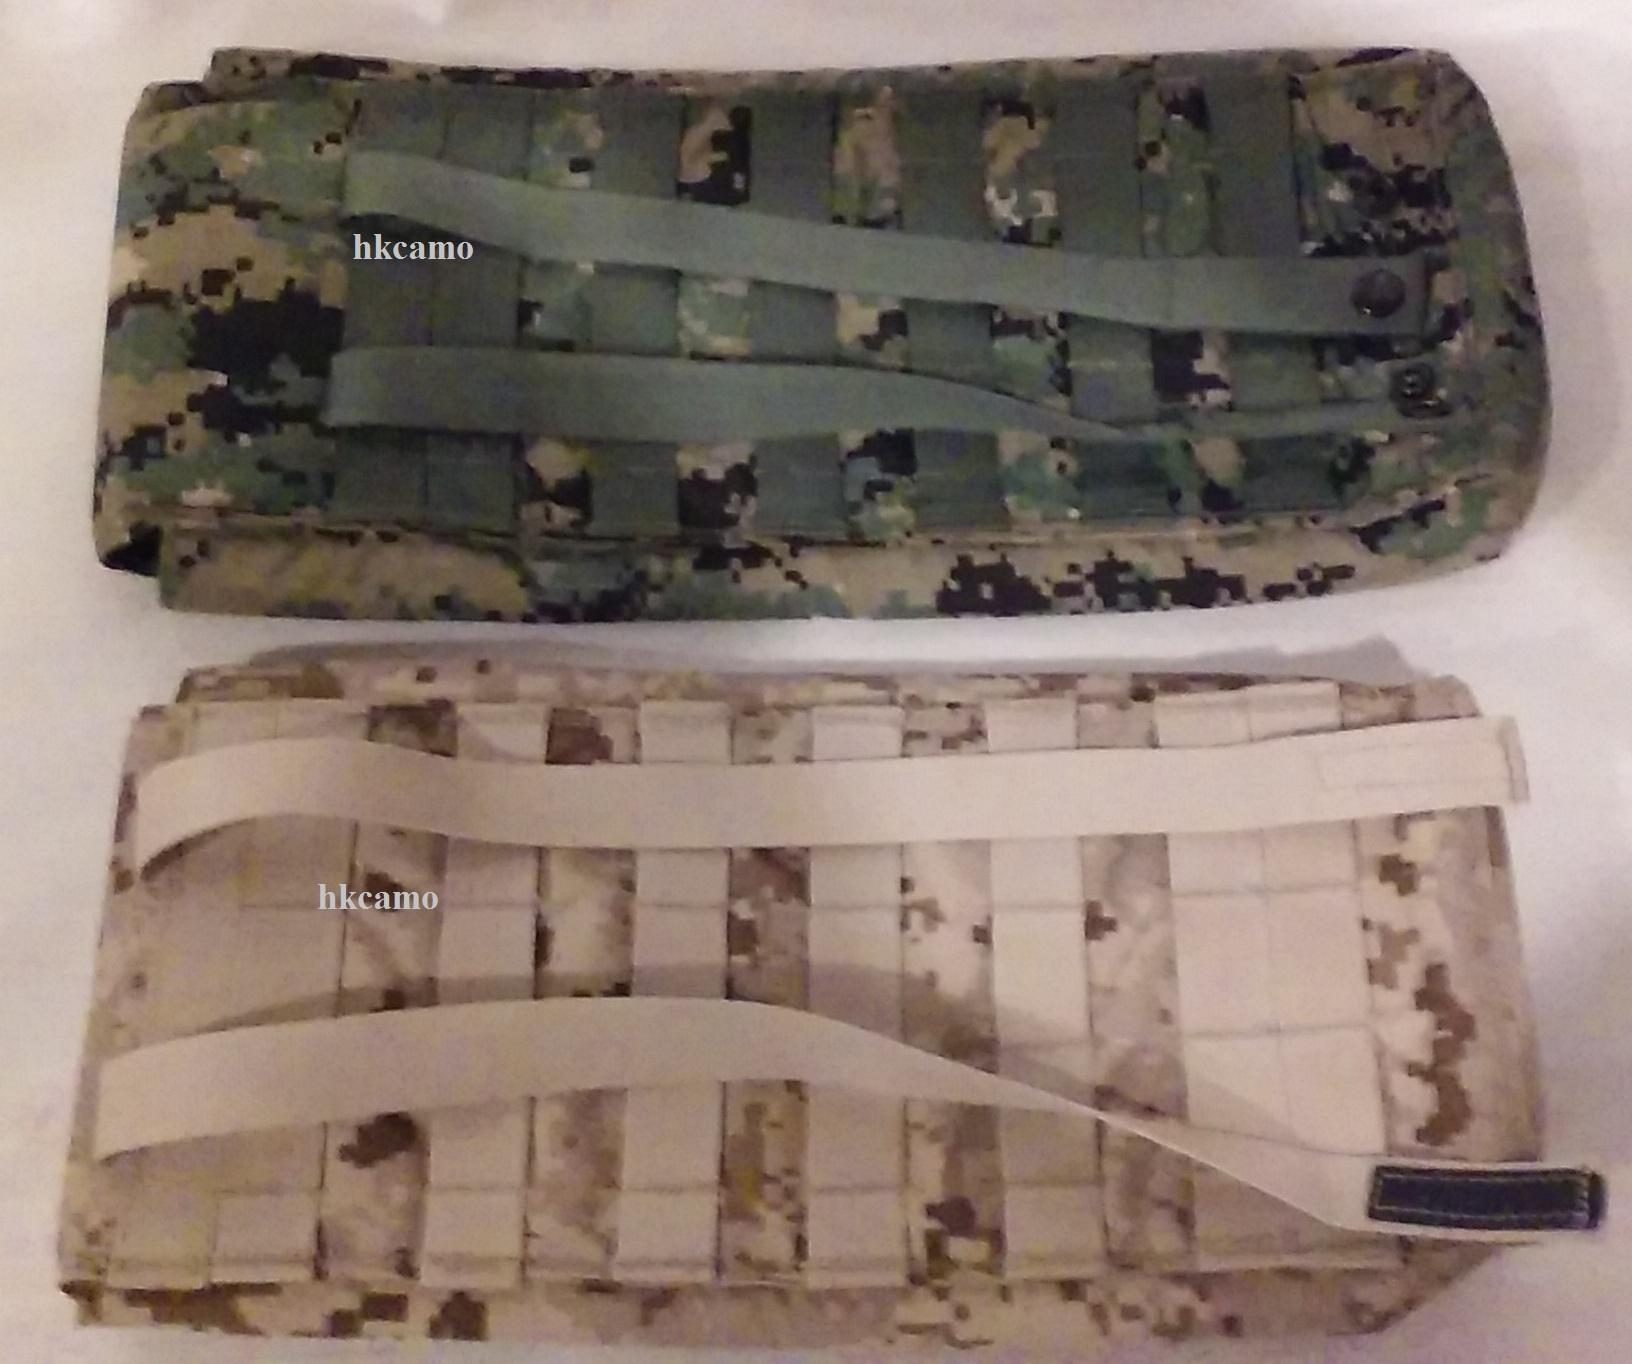 London Bridge Trading Co LTD MAS Grey H&K 416 417 MP7 MK24 HK45CT Operator Kit (Rare)-lbt_hydros.jpg